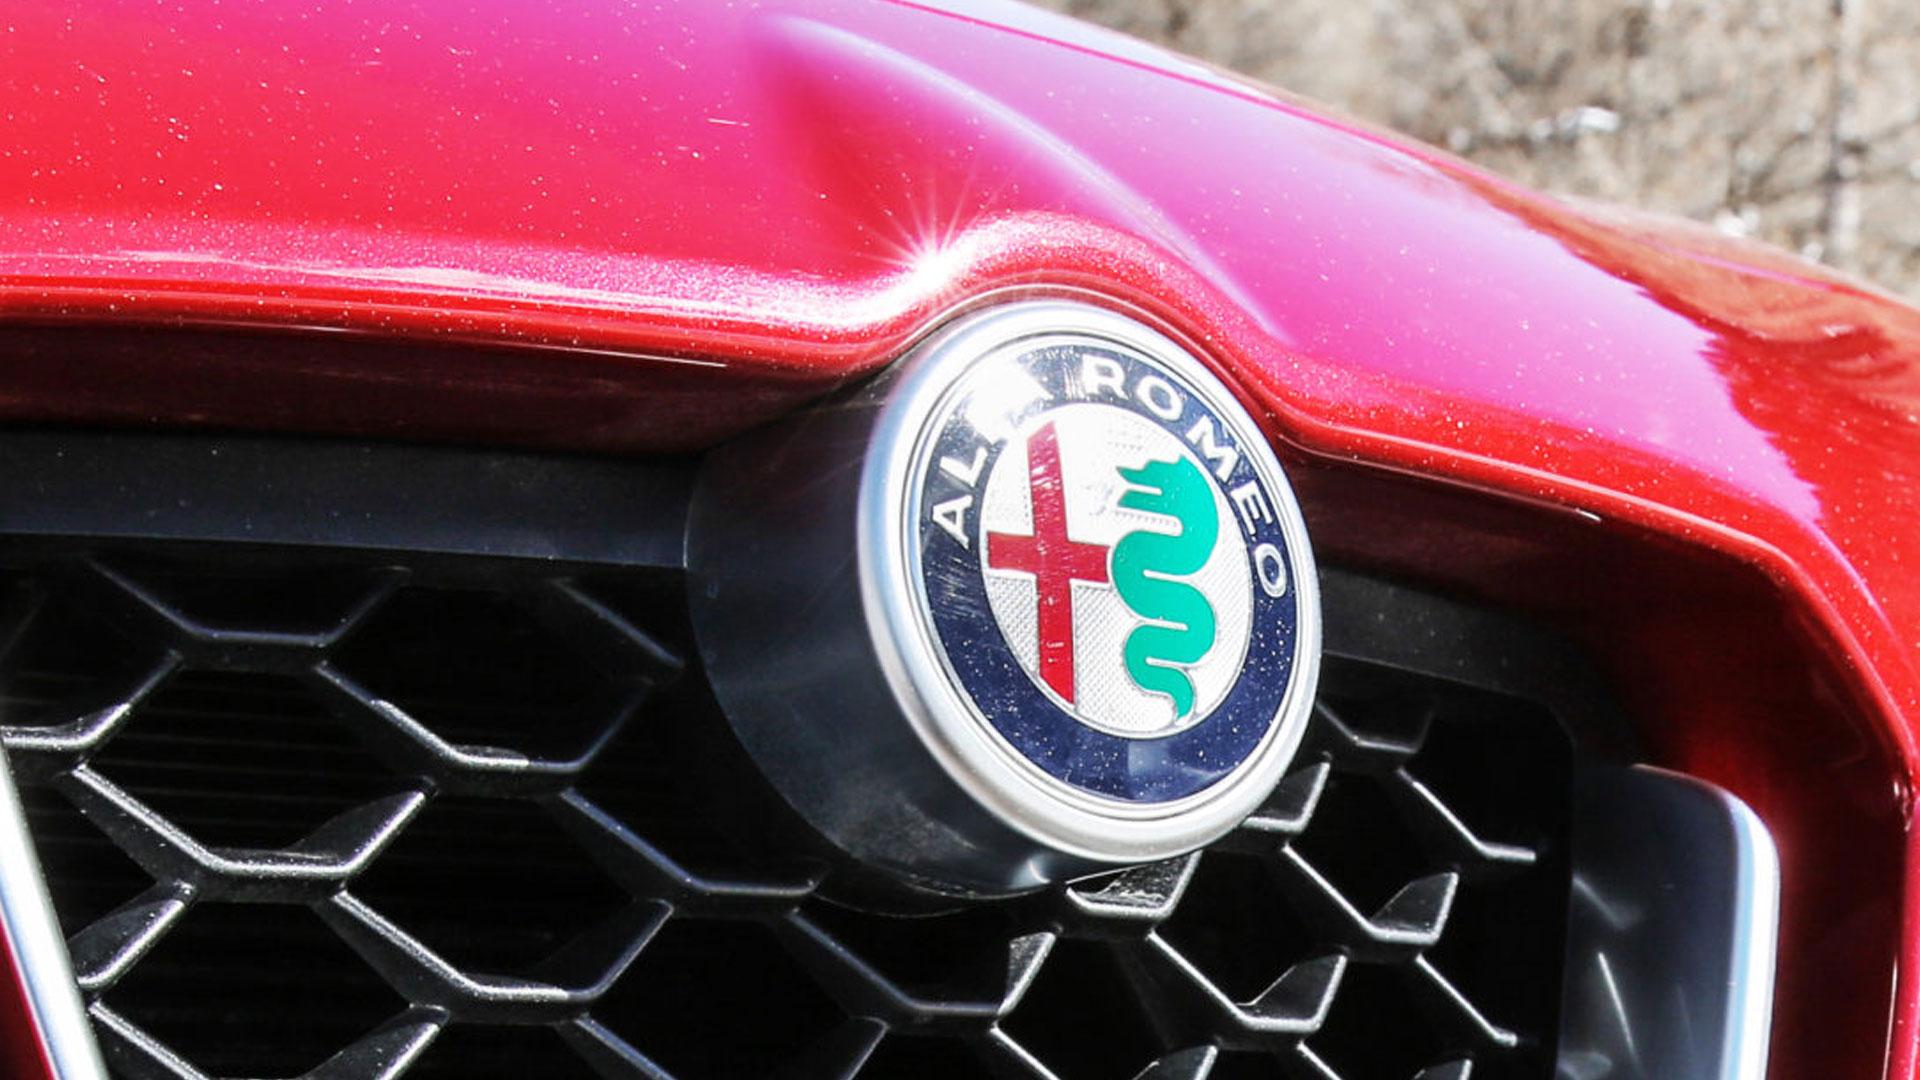 Alfa Romeo-logo in de grille van de Stelvio (badge)